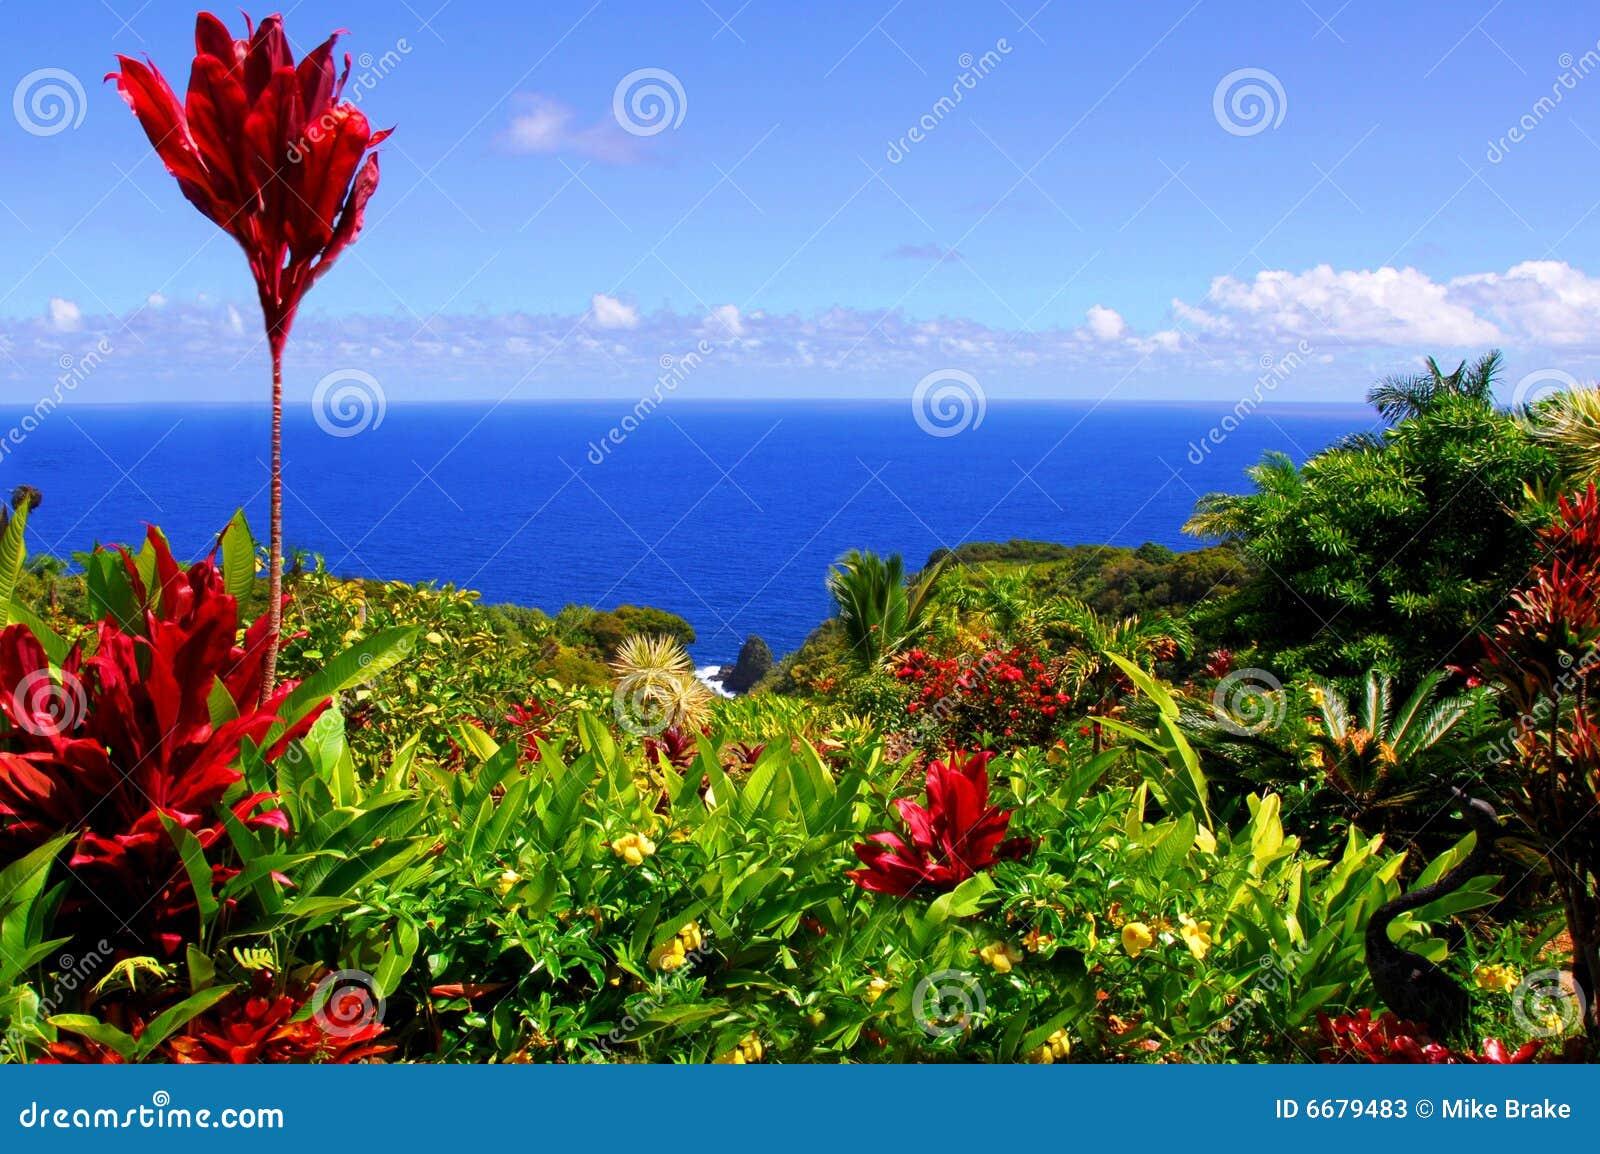 Garden Of Eden, Maui Hawaii